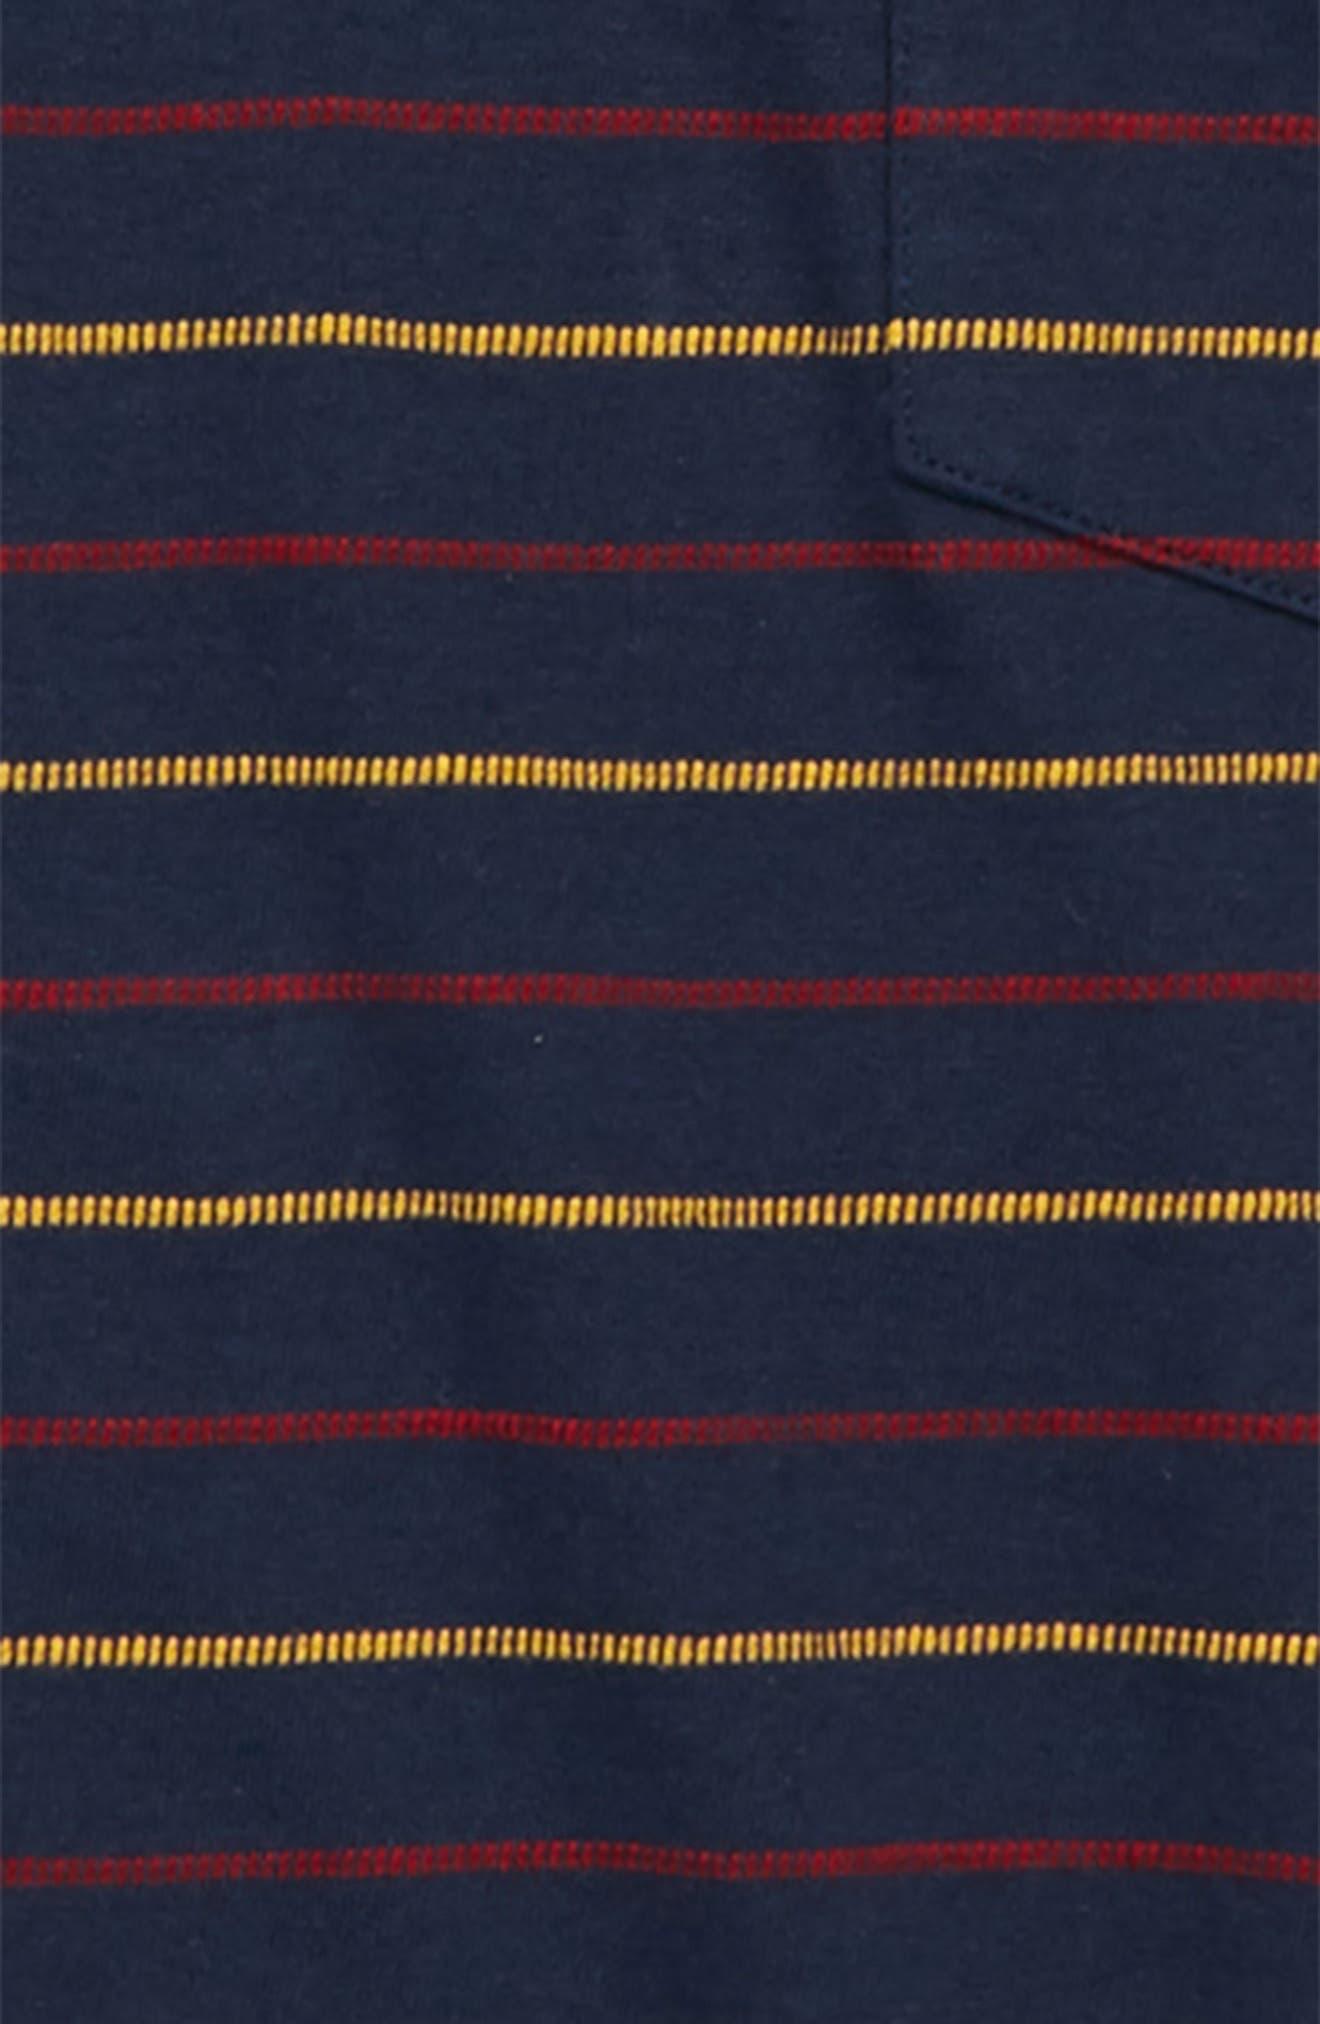 Strikemont III T-Shirt,                             Alternate thumbnail 2, color,                             DRESS BLUES